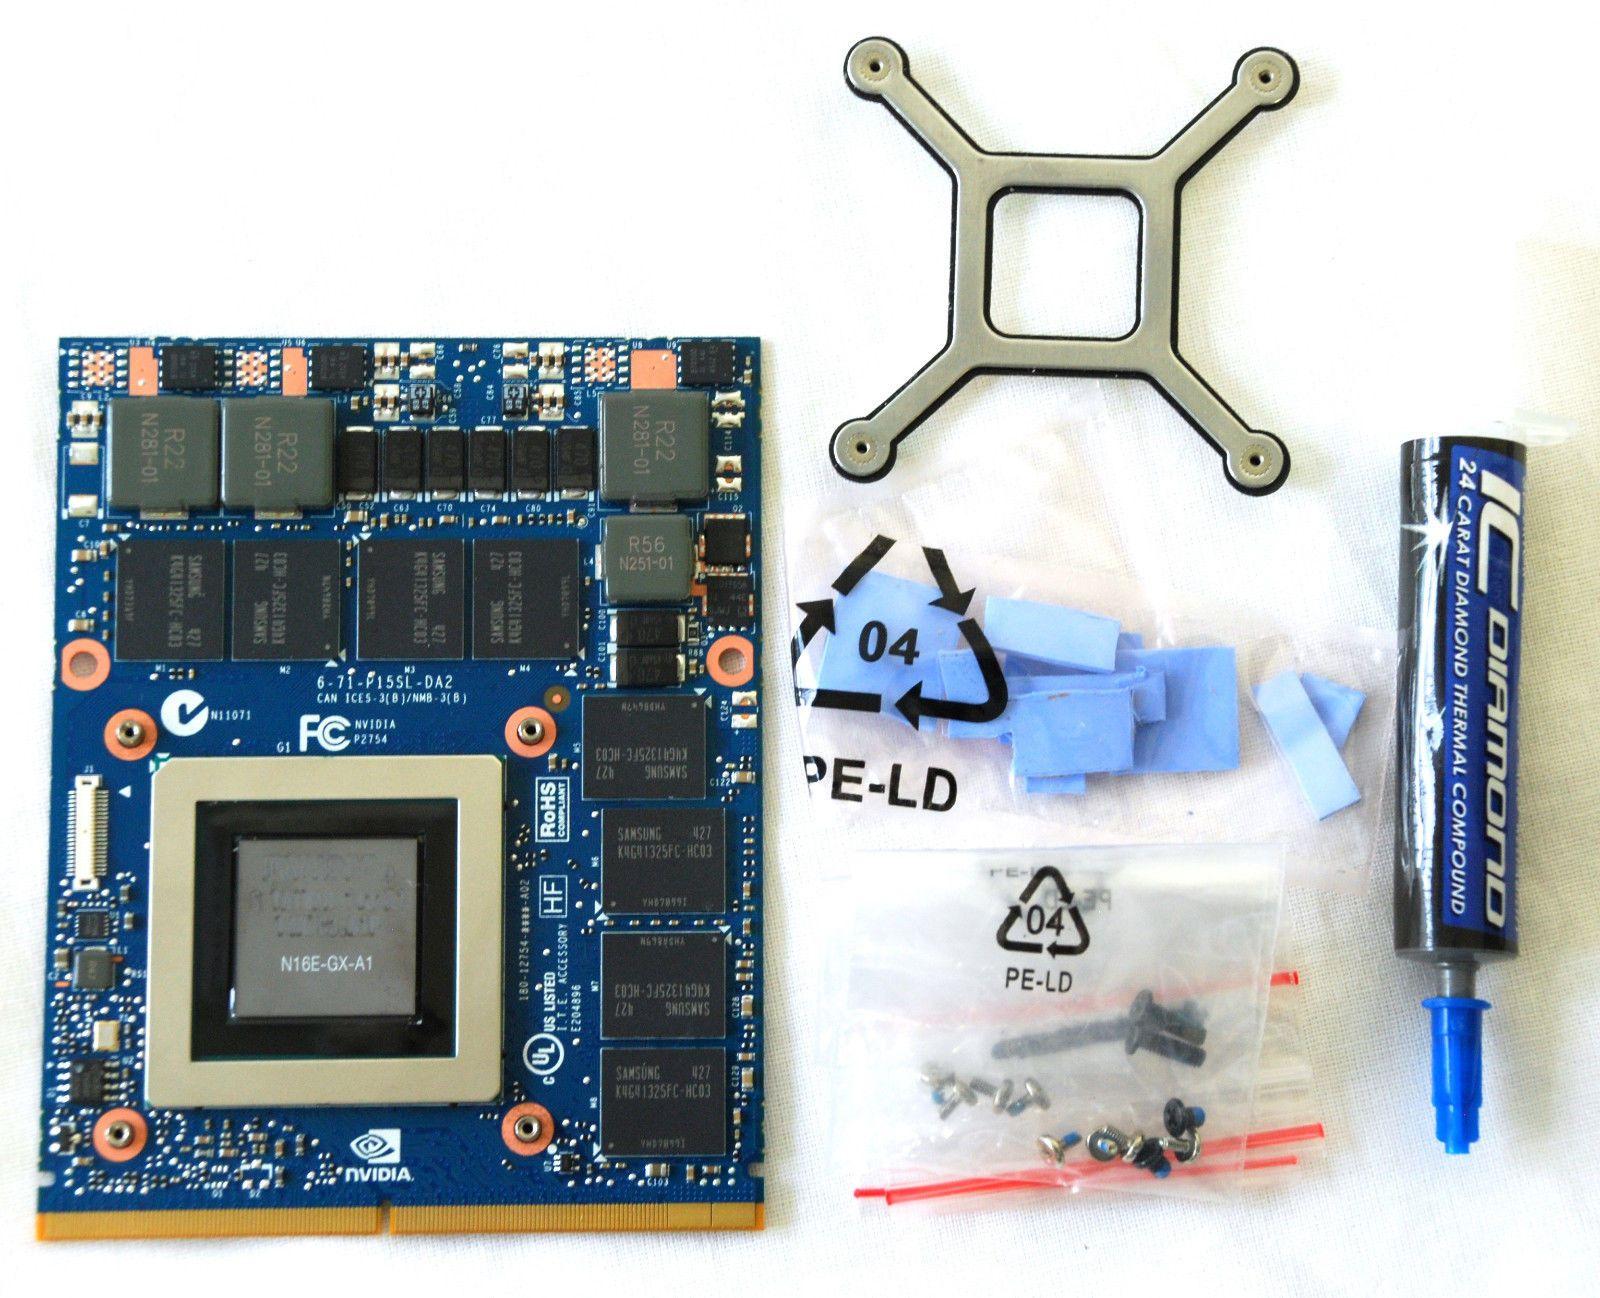 Dell Precision M6800 Laptop Video card upgrade kits MXM 3 0b